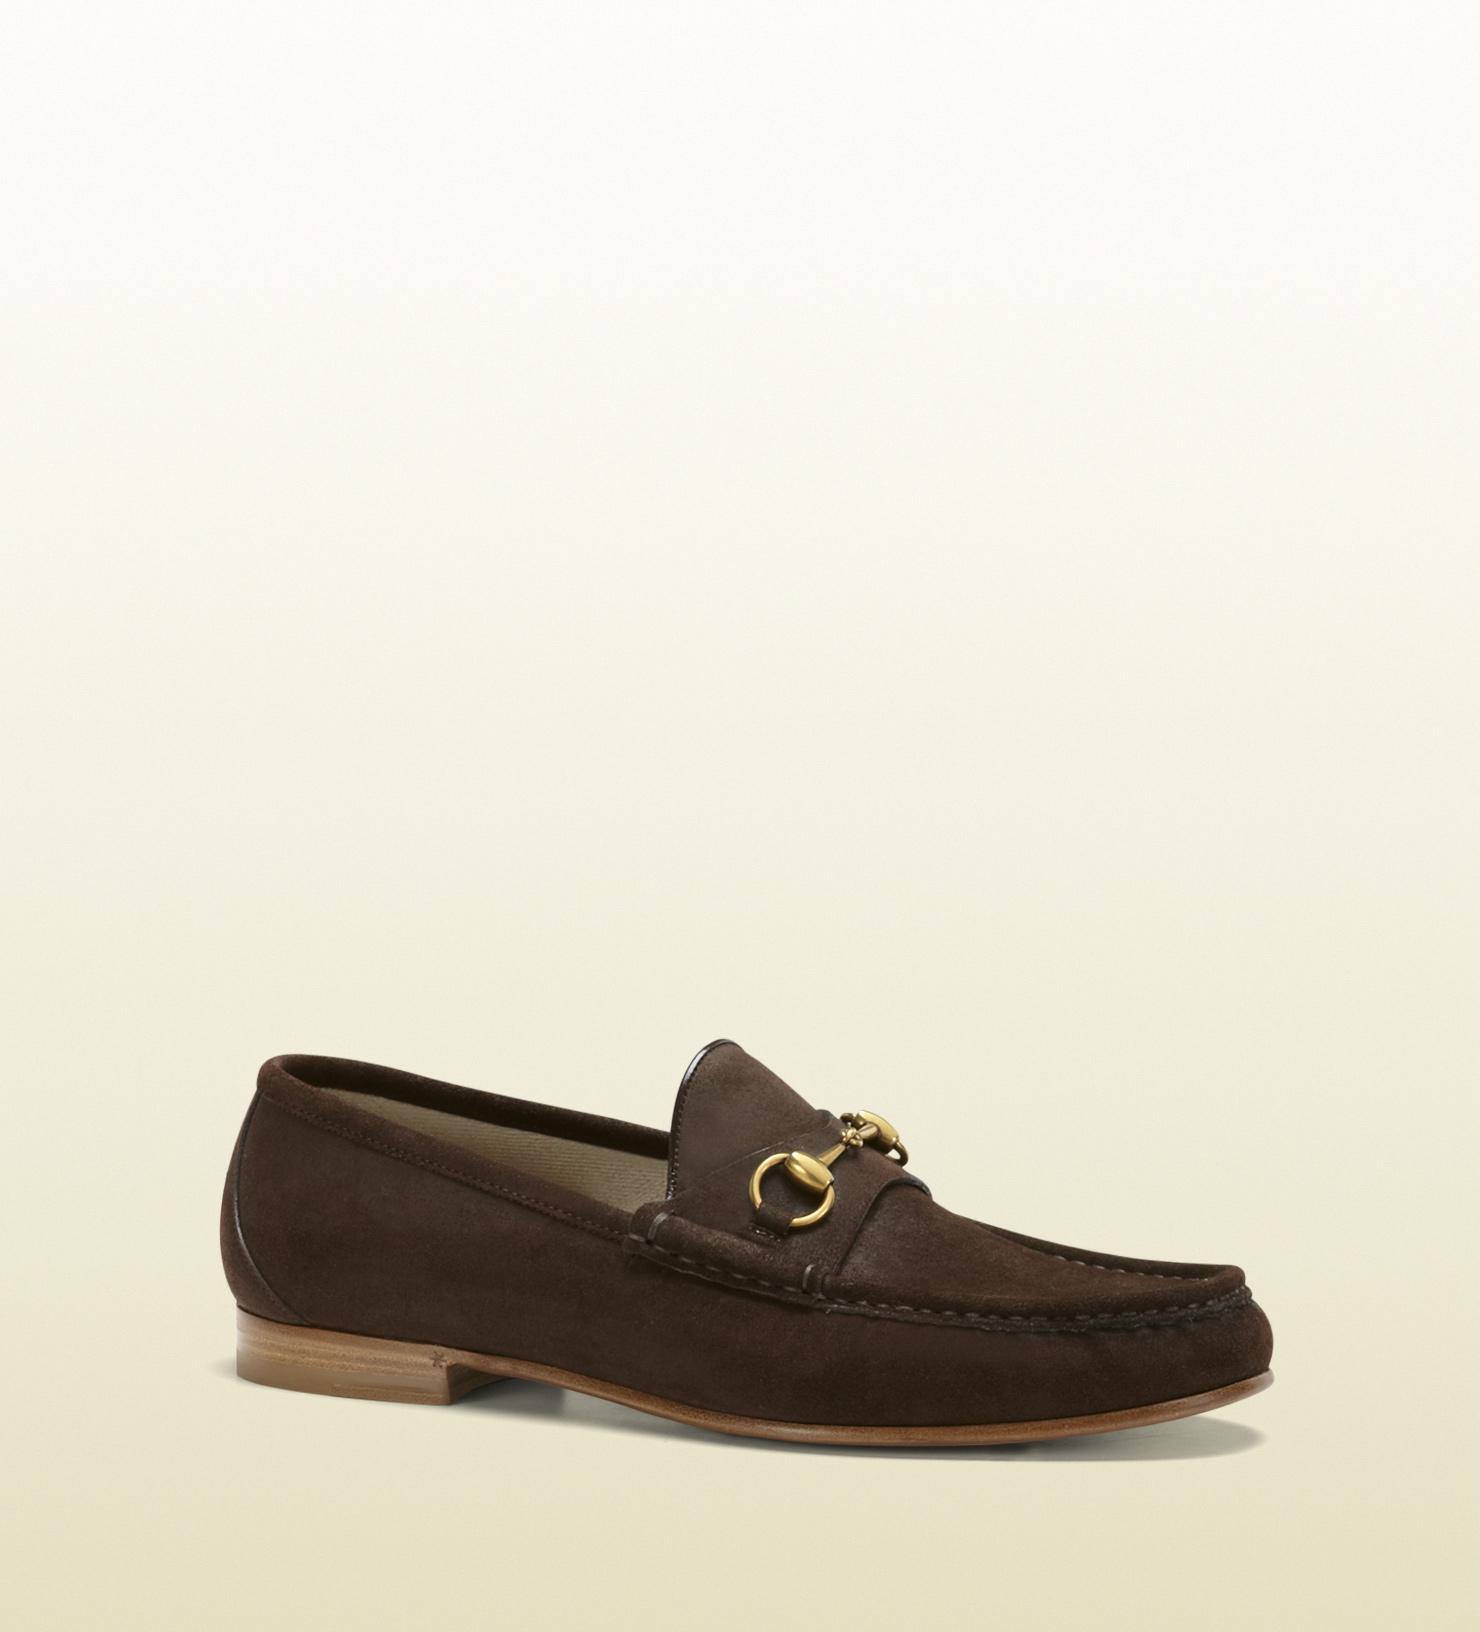 lyst gucci 1953 horsebit loafer in suede in brown for men. Black Bedroom Furniture Sets. Home Design Ideas